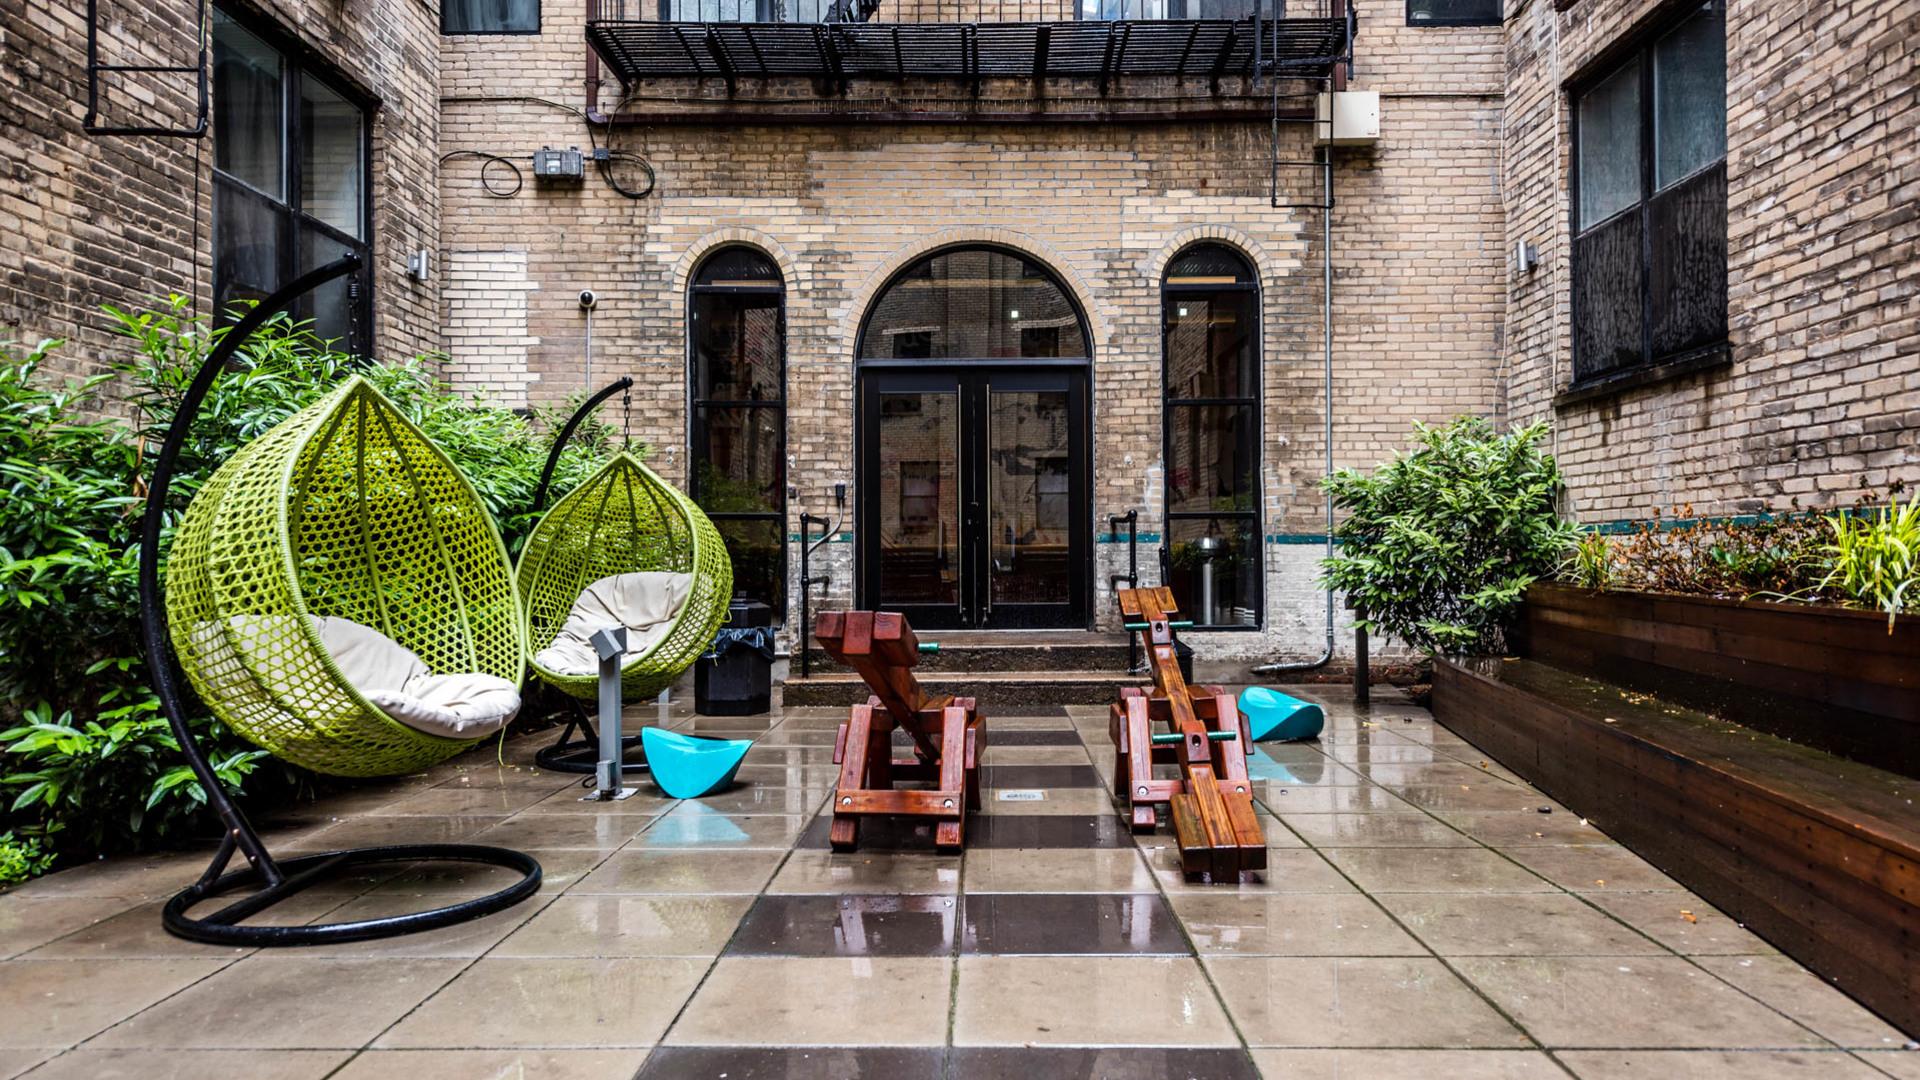 017 1635 putnam avenue courtyard 3